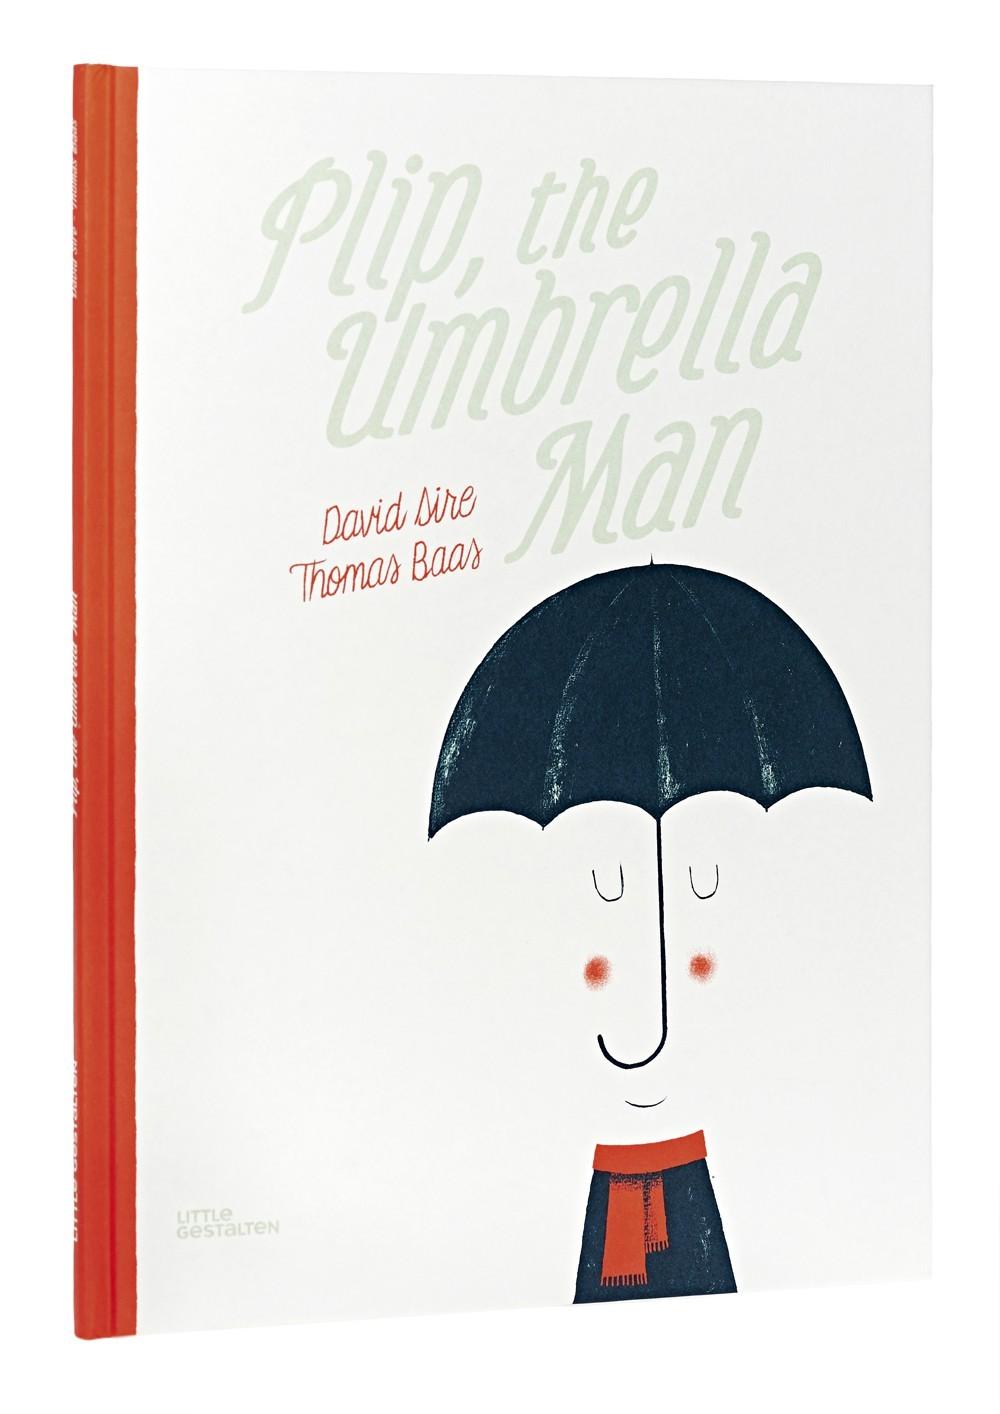 PLIP THE UMBRELLA MAN /ANGLAIS